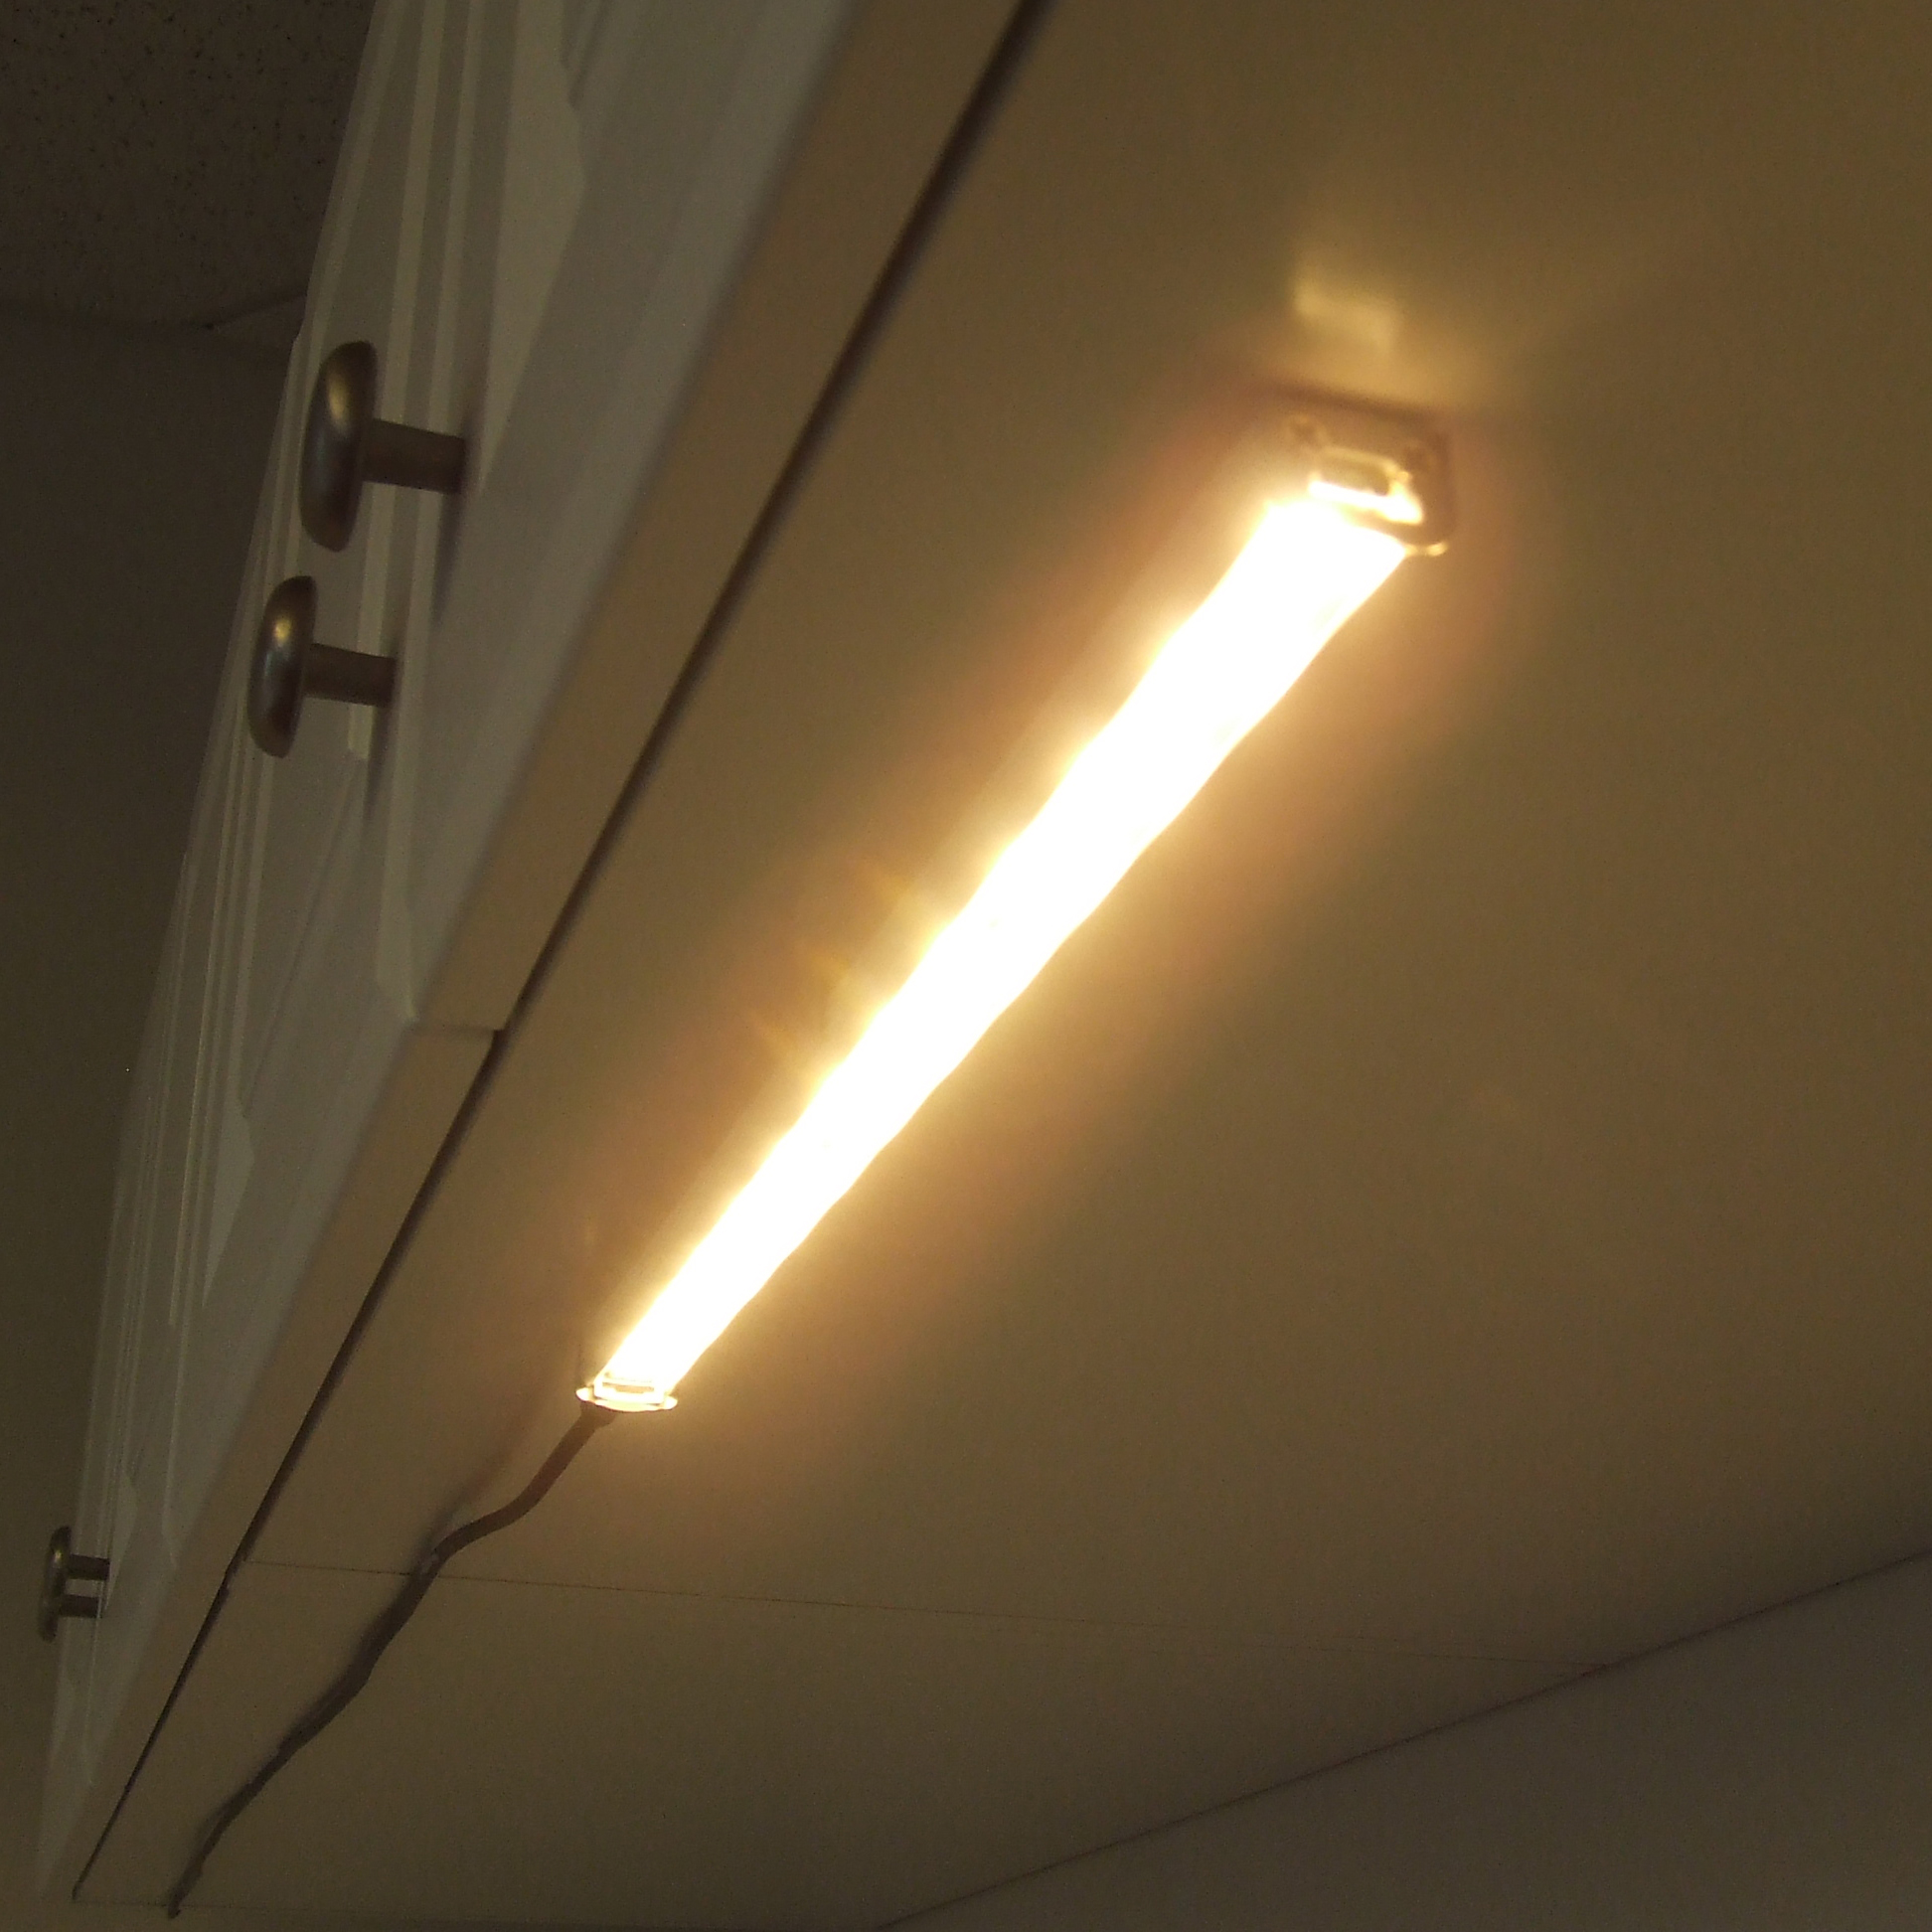 Environmentallights Com Offers High Brightness Premium